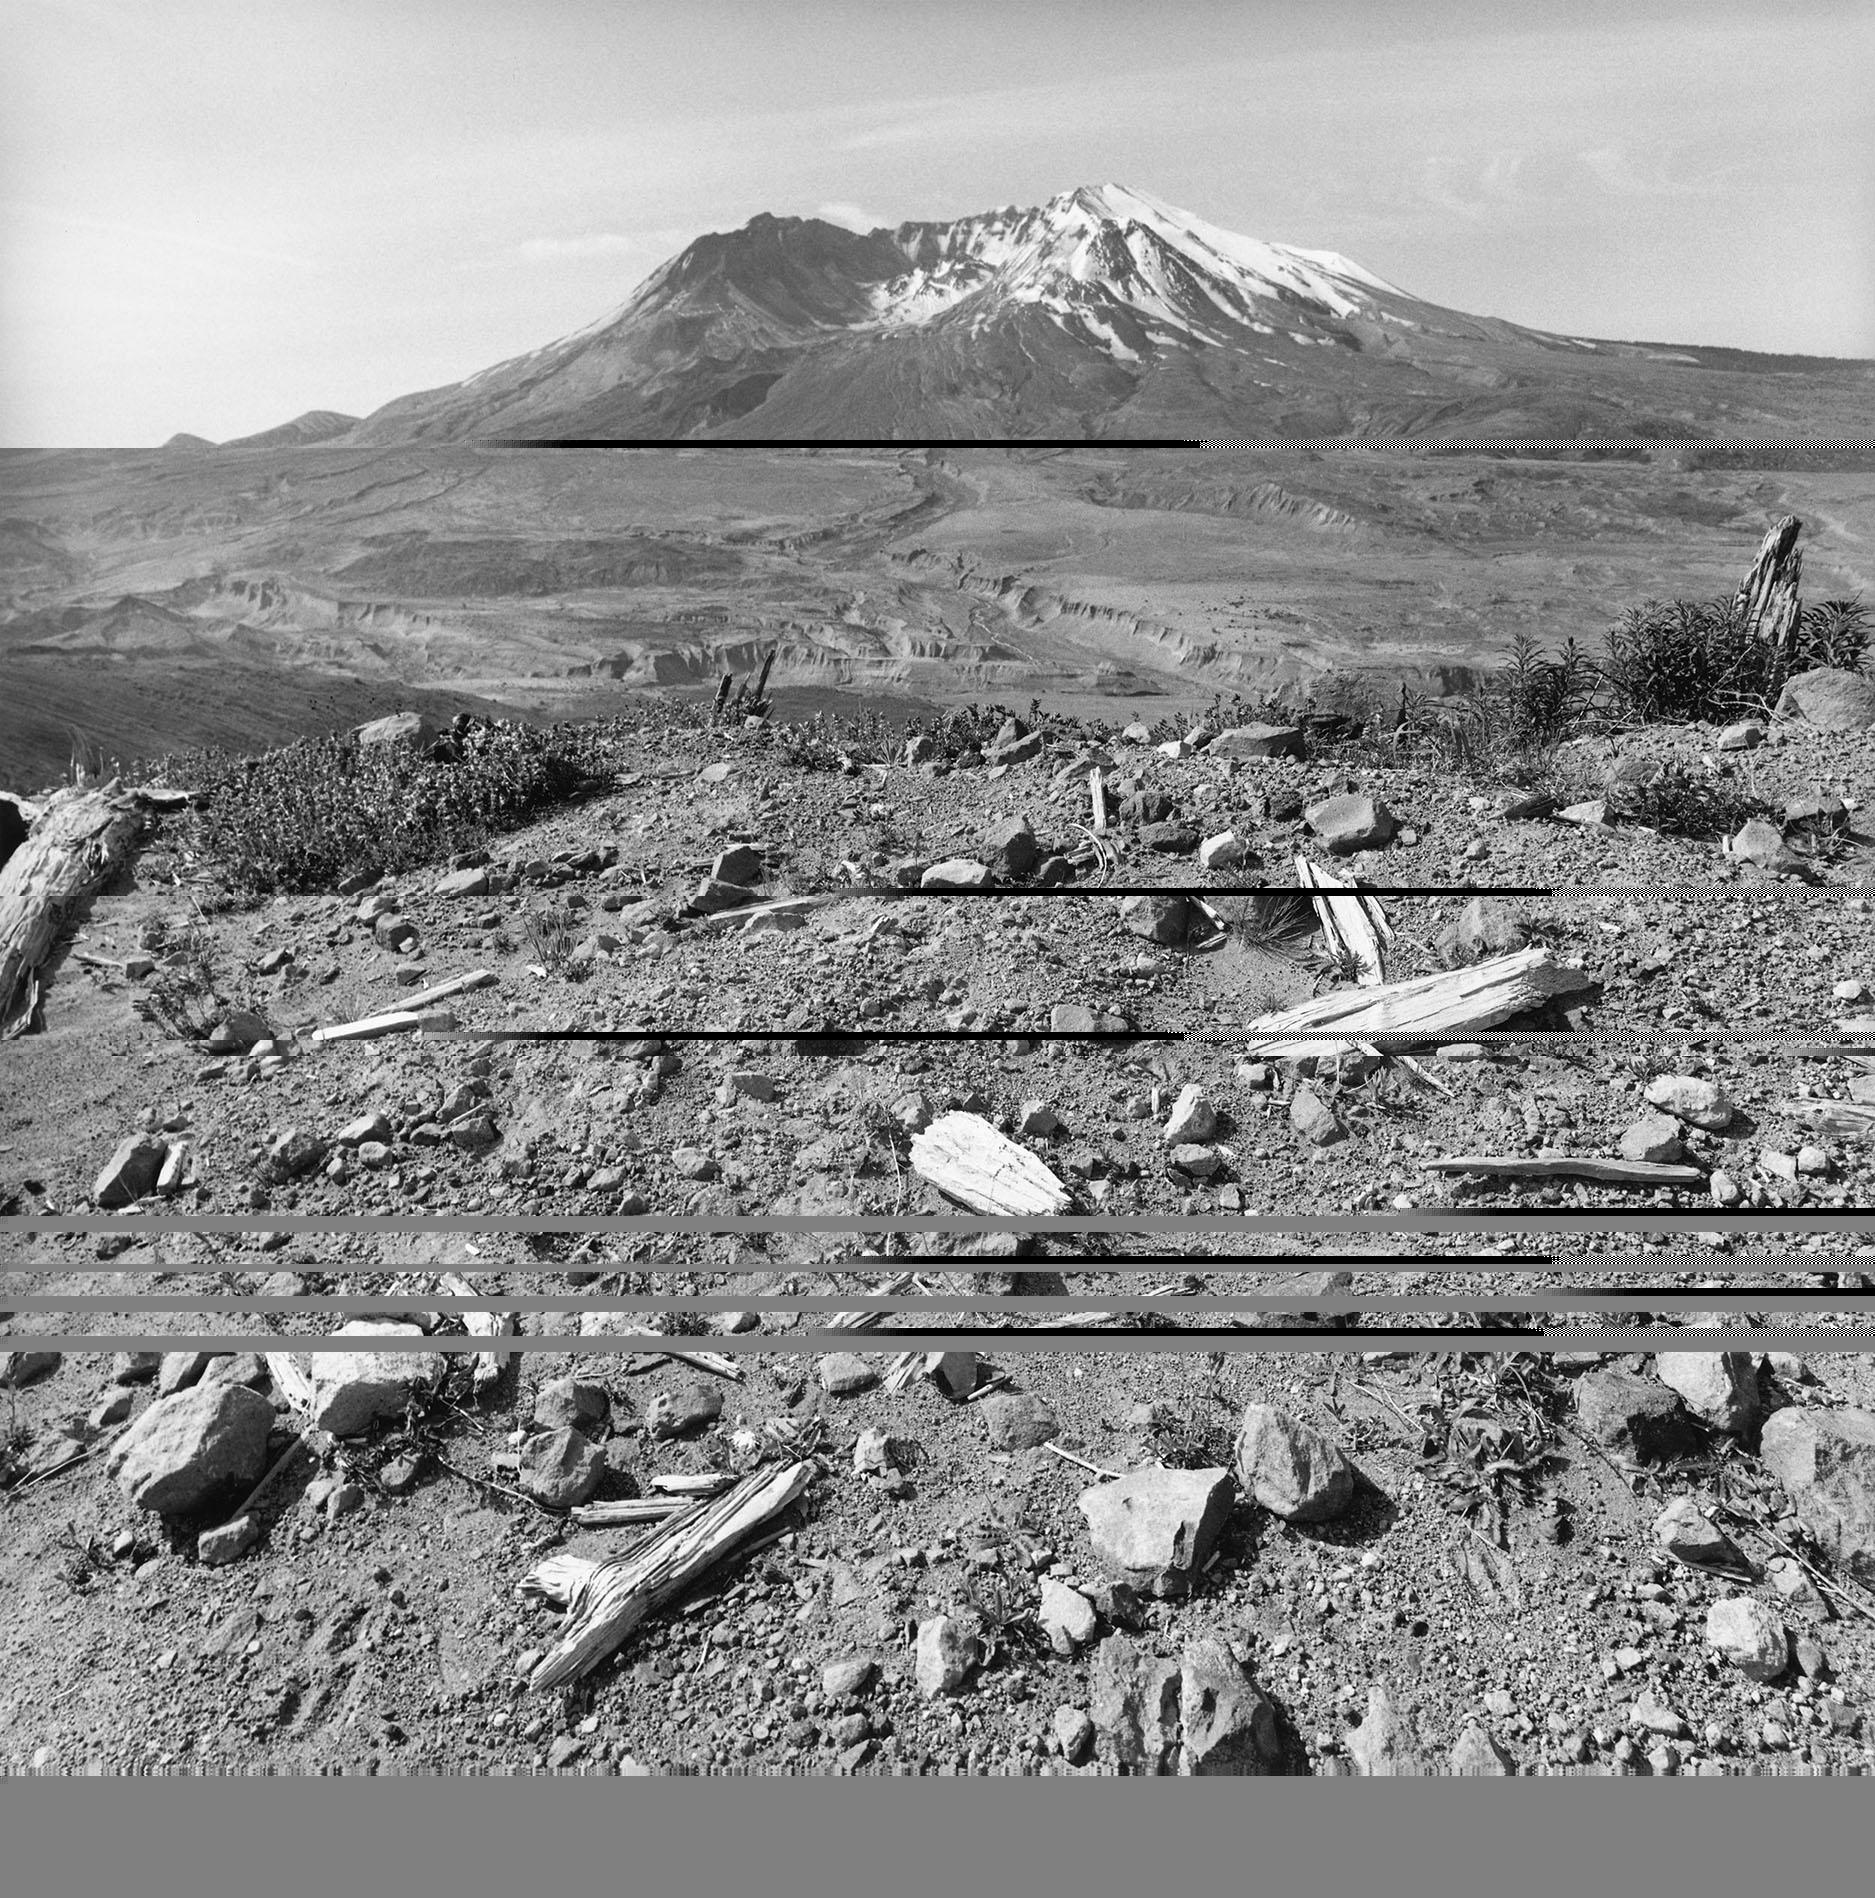 Mount Saint Helens, Washington, 2001. Gelatin silver print. © Lee Friedlander, Courtesy Fraenkel Gallery, San Francisco